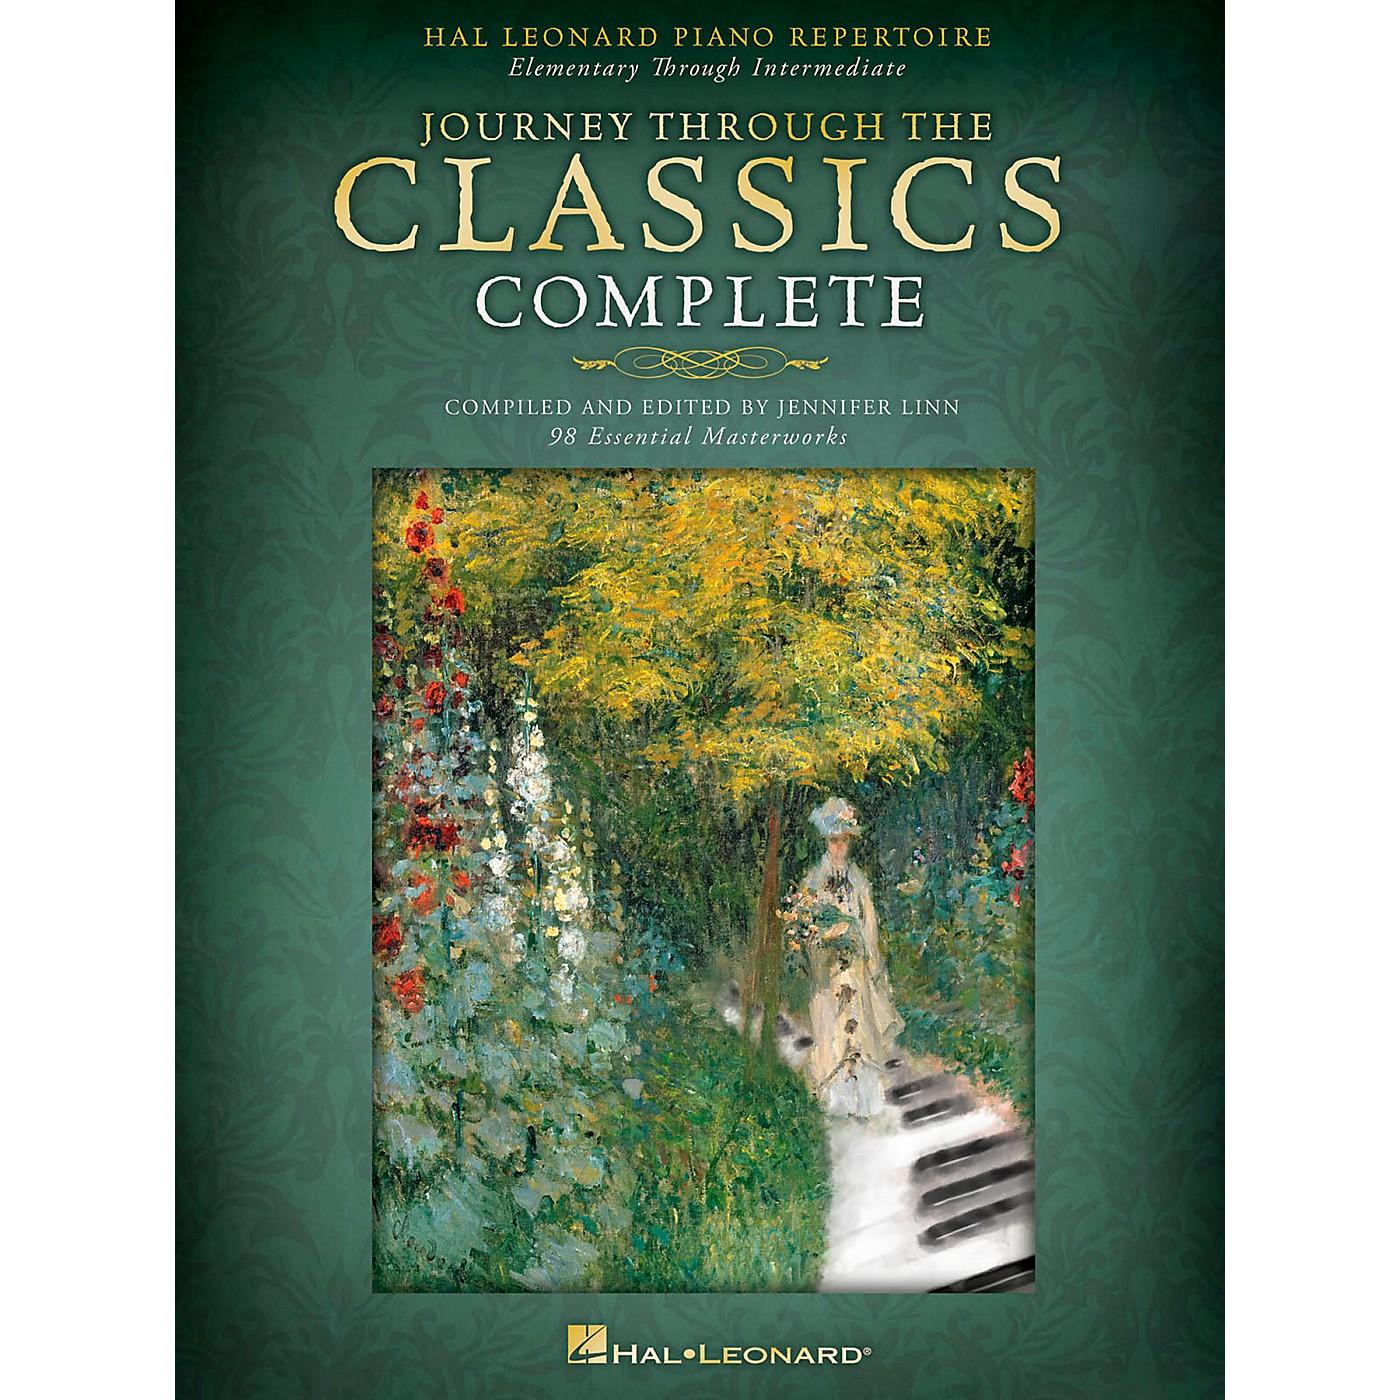 Hal Leonard Piano Repertoire-Journey Through The Classics Complete thumbnail